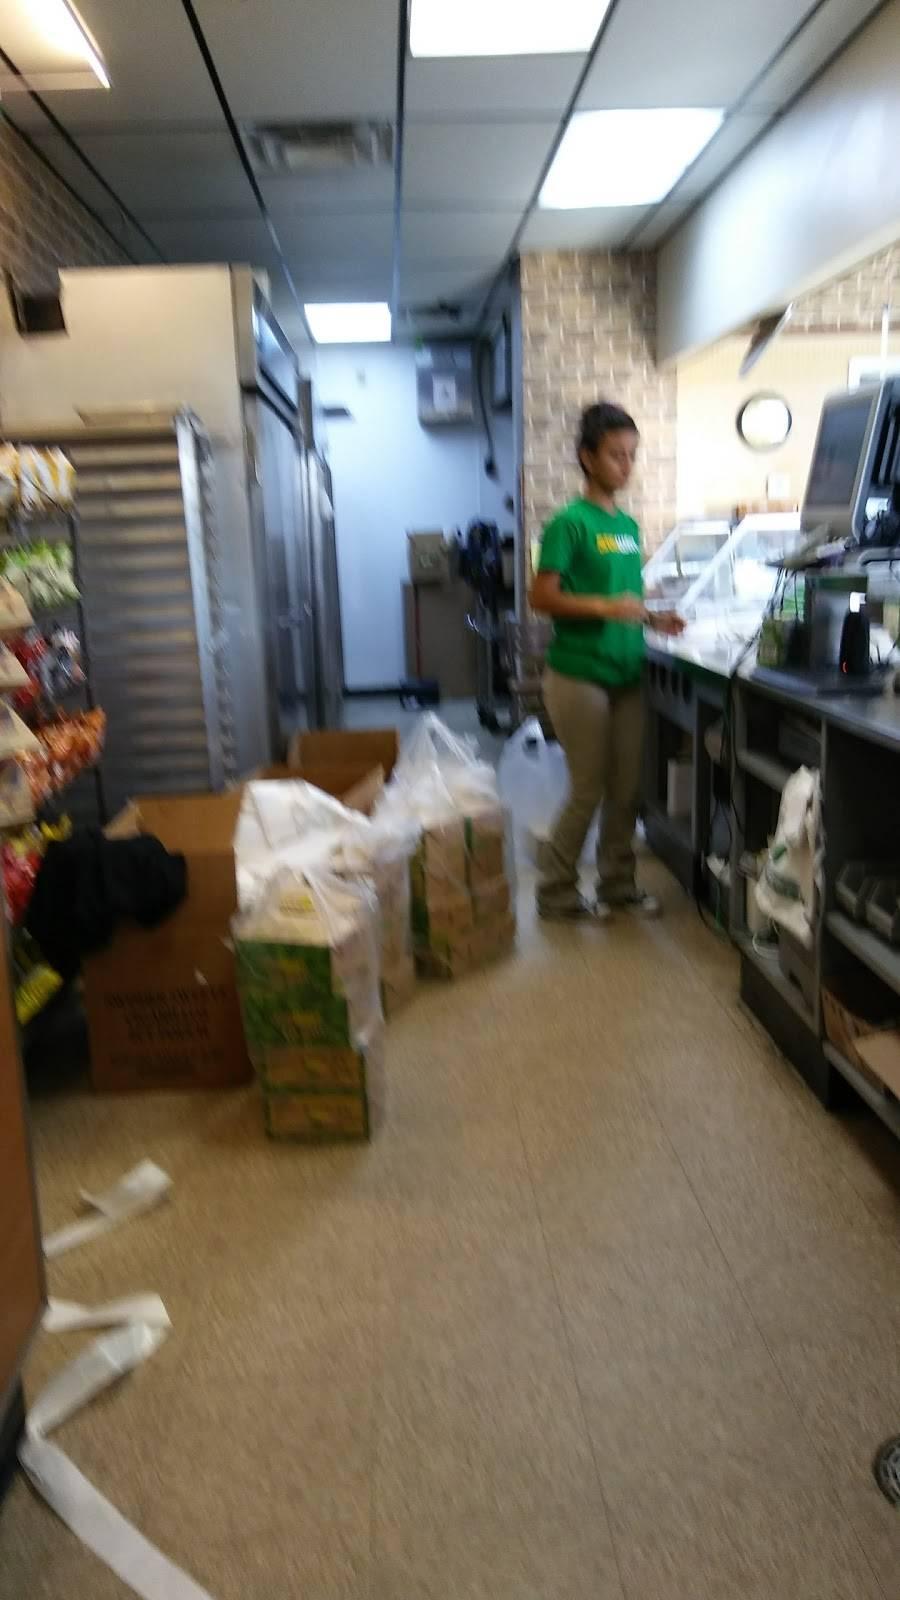 Subway - meal takeaway  | Photo 6 of 7 | Address: 4948 N Peoria Ave, Tulsa, OK 74126, USA | Phone: (918) 425-6209